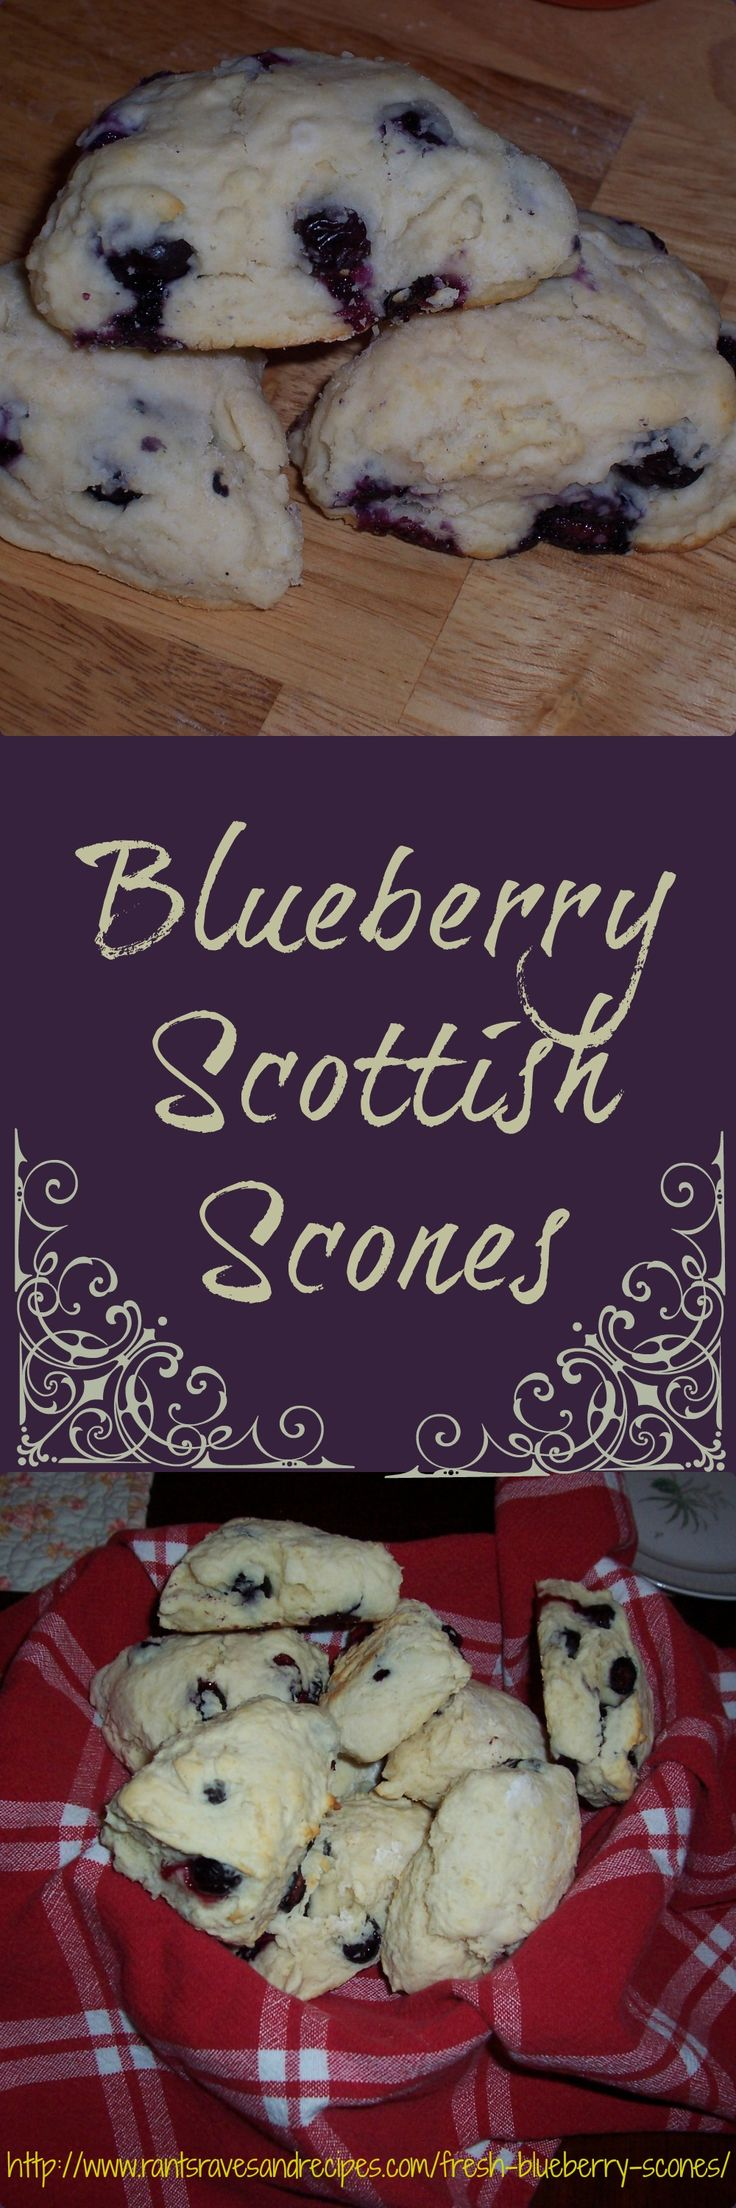 Fresh Blueberry Scottish Scones, a summer treat that can't be beat! #Best Blueberry Scottish Scones